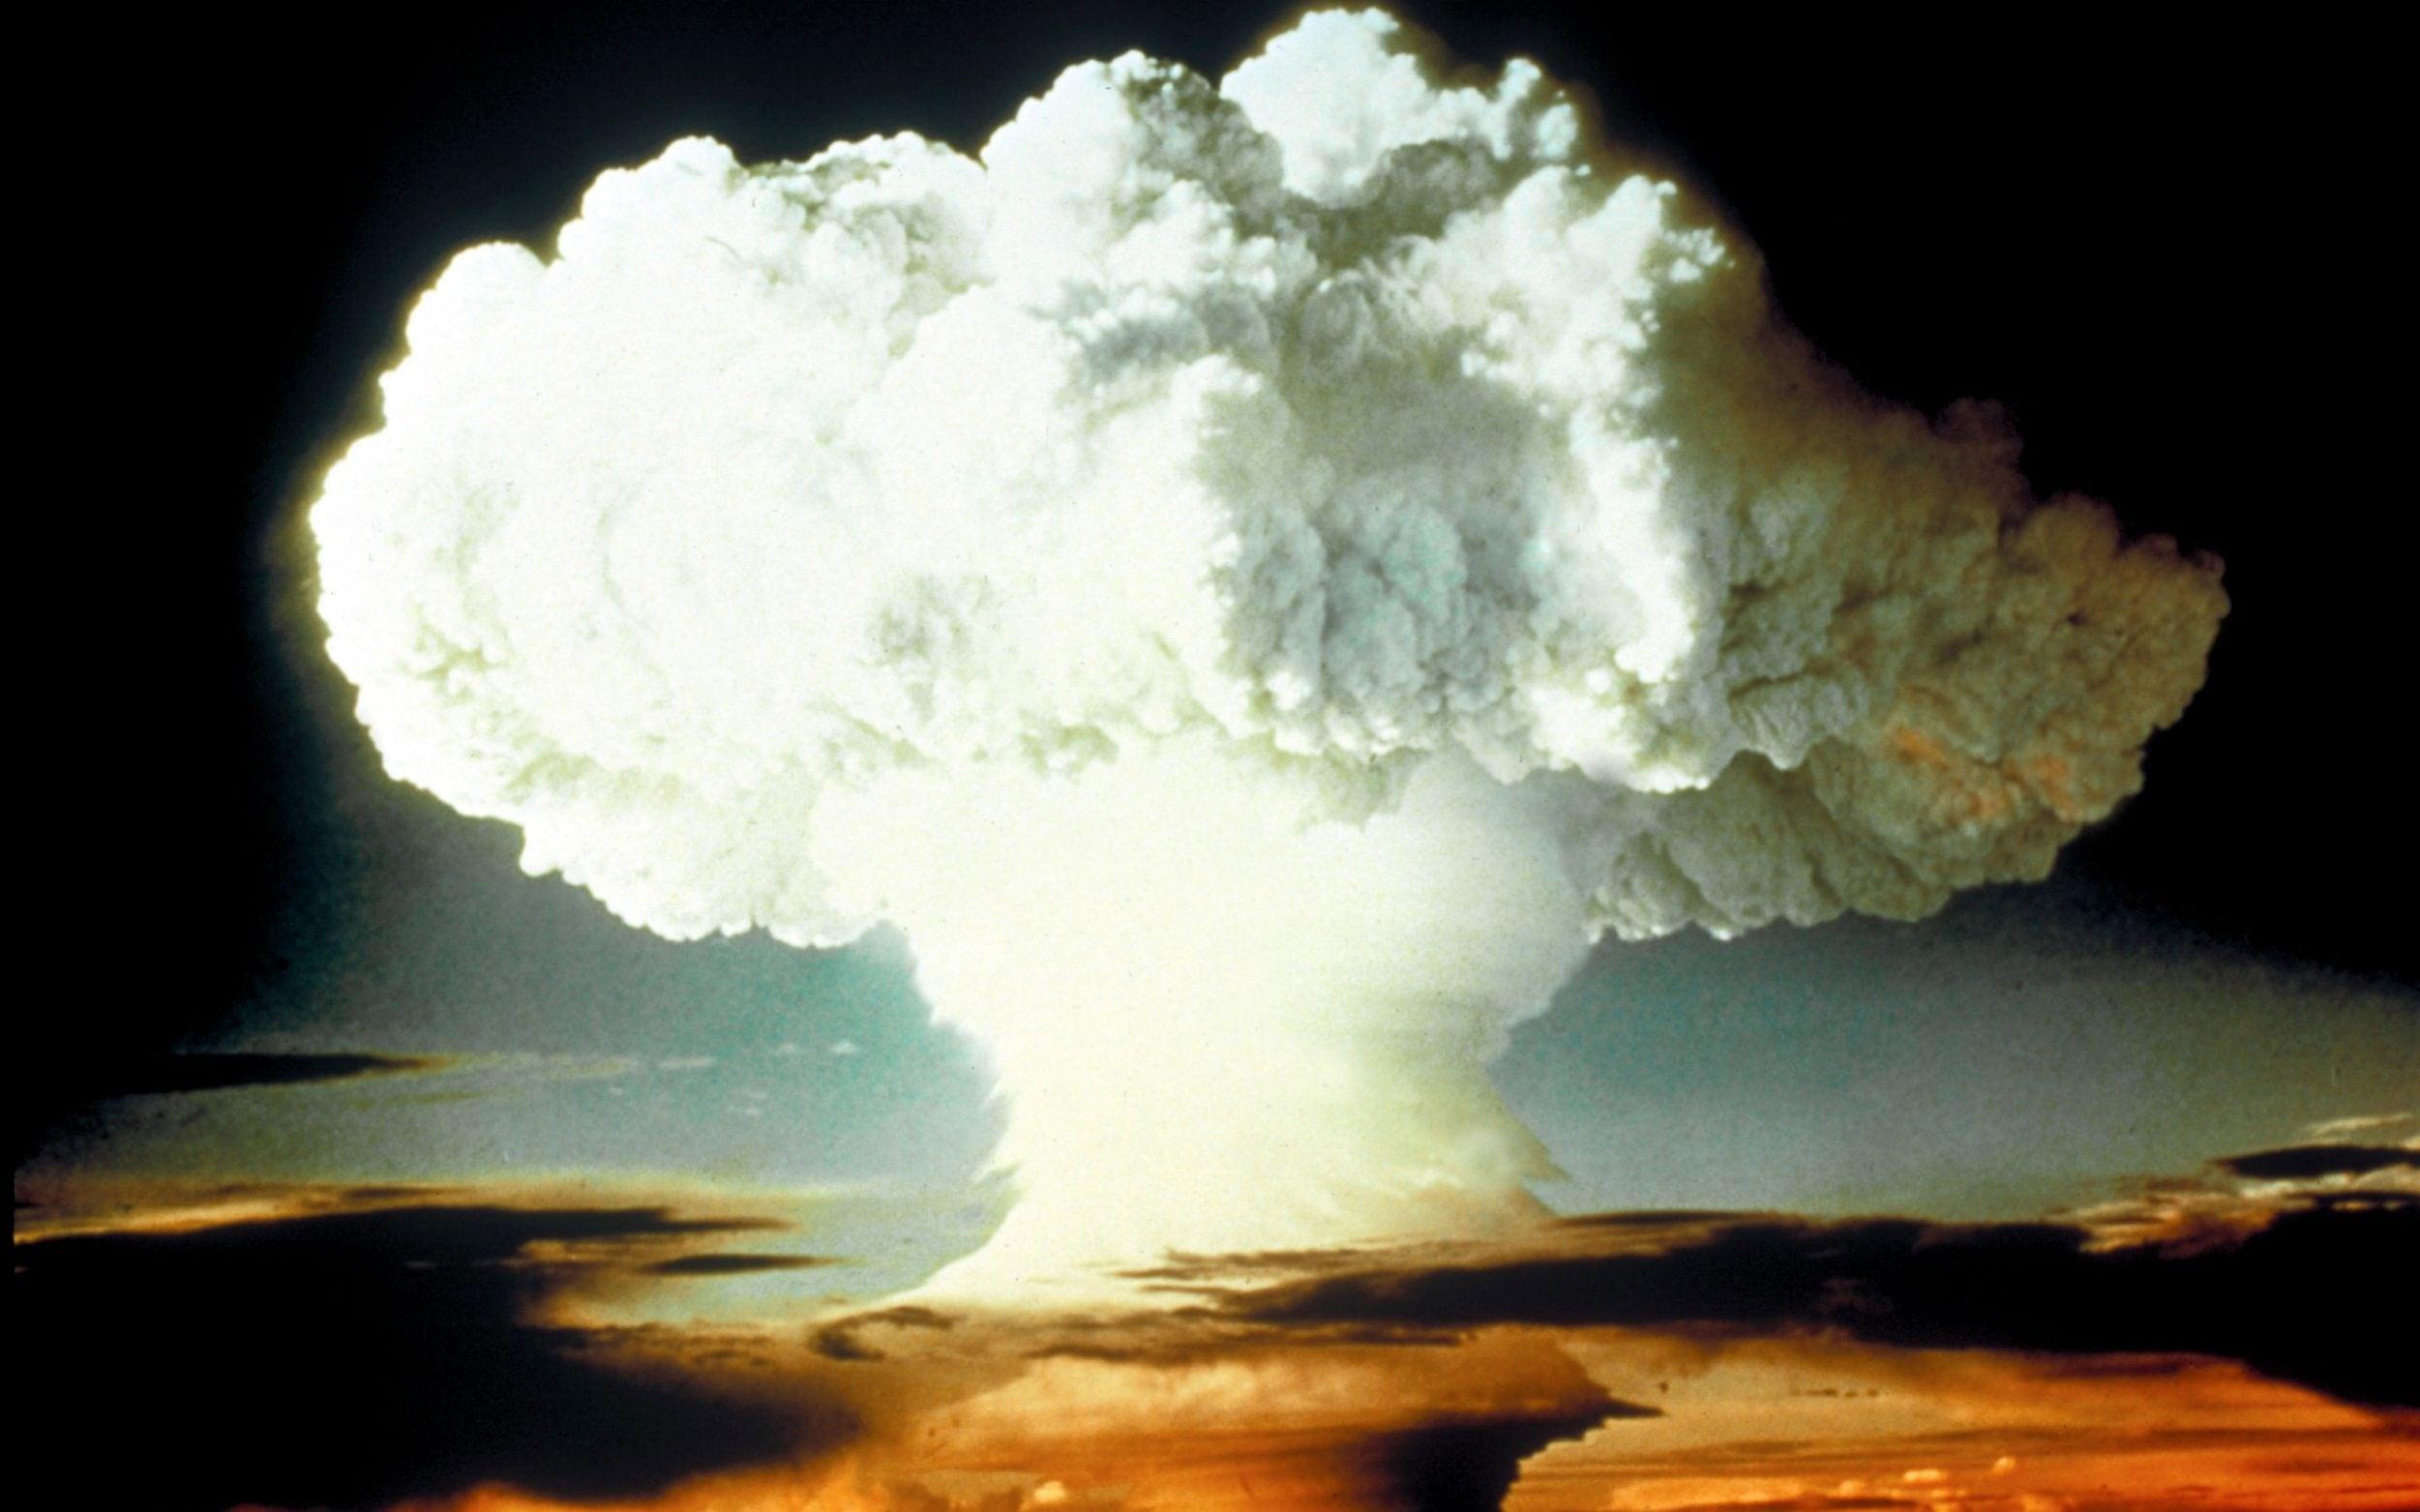 India-Pakistan nuclear war could kill 125 million